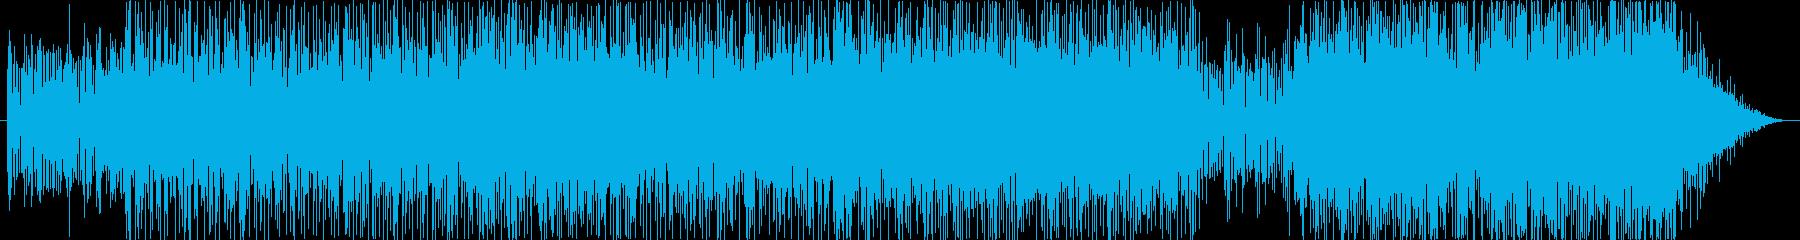 Pacific Sketchesの再生済みの波形